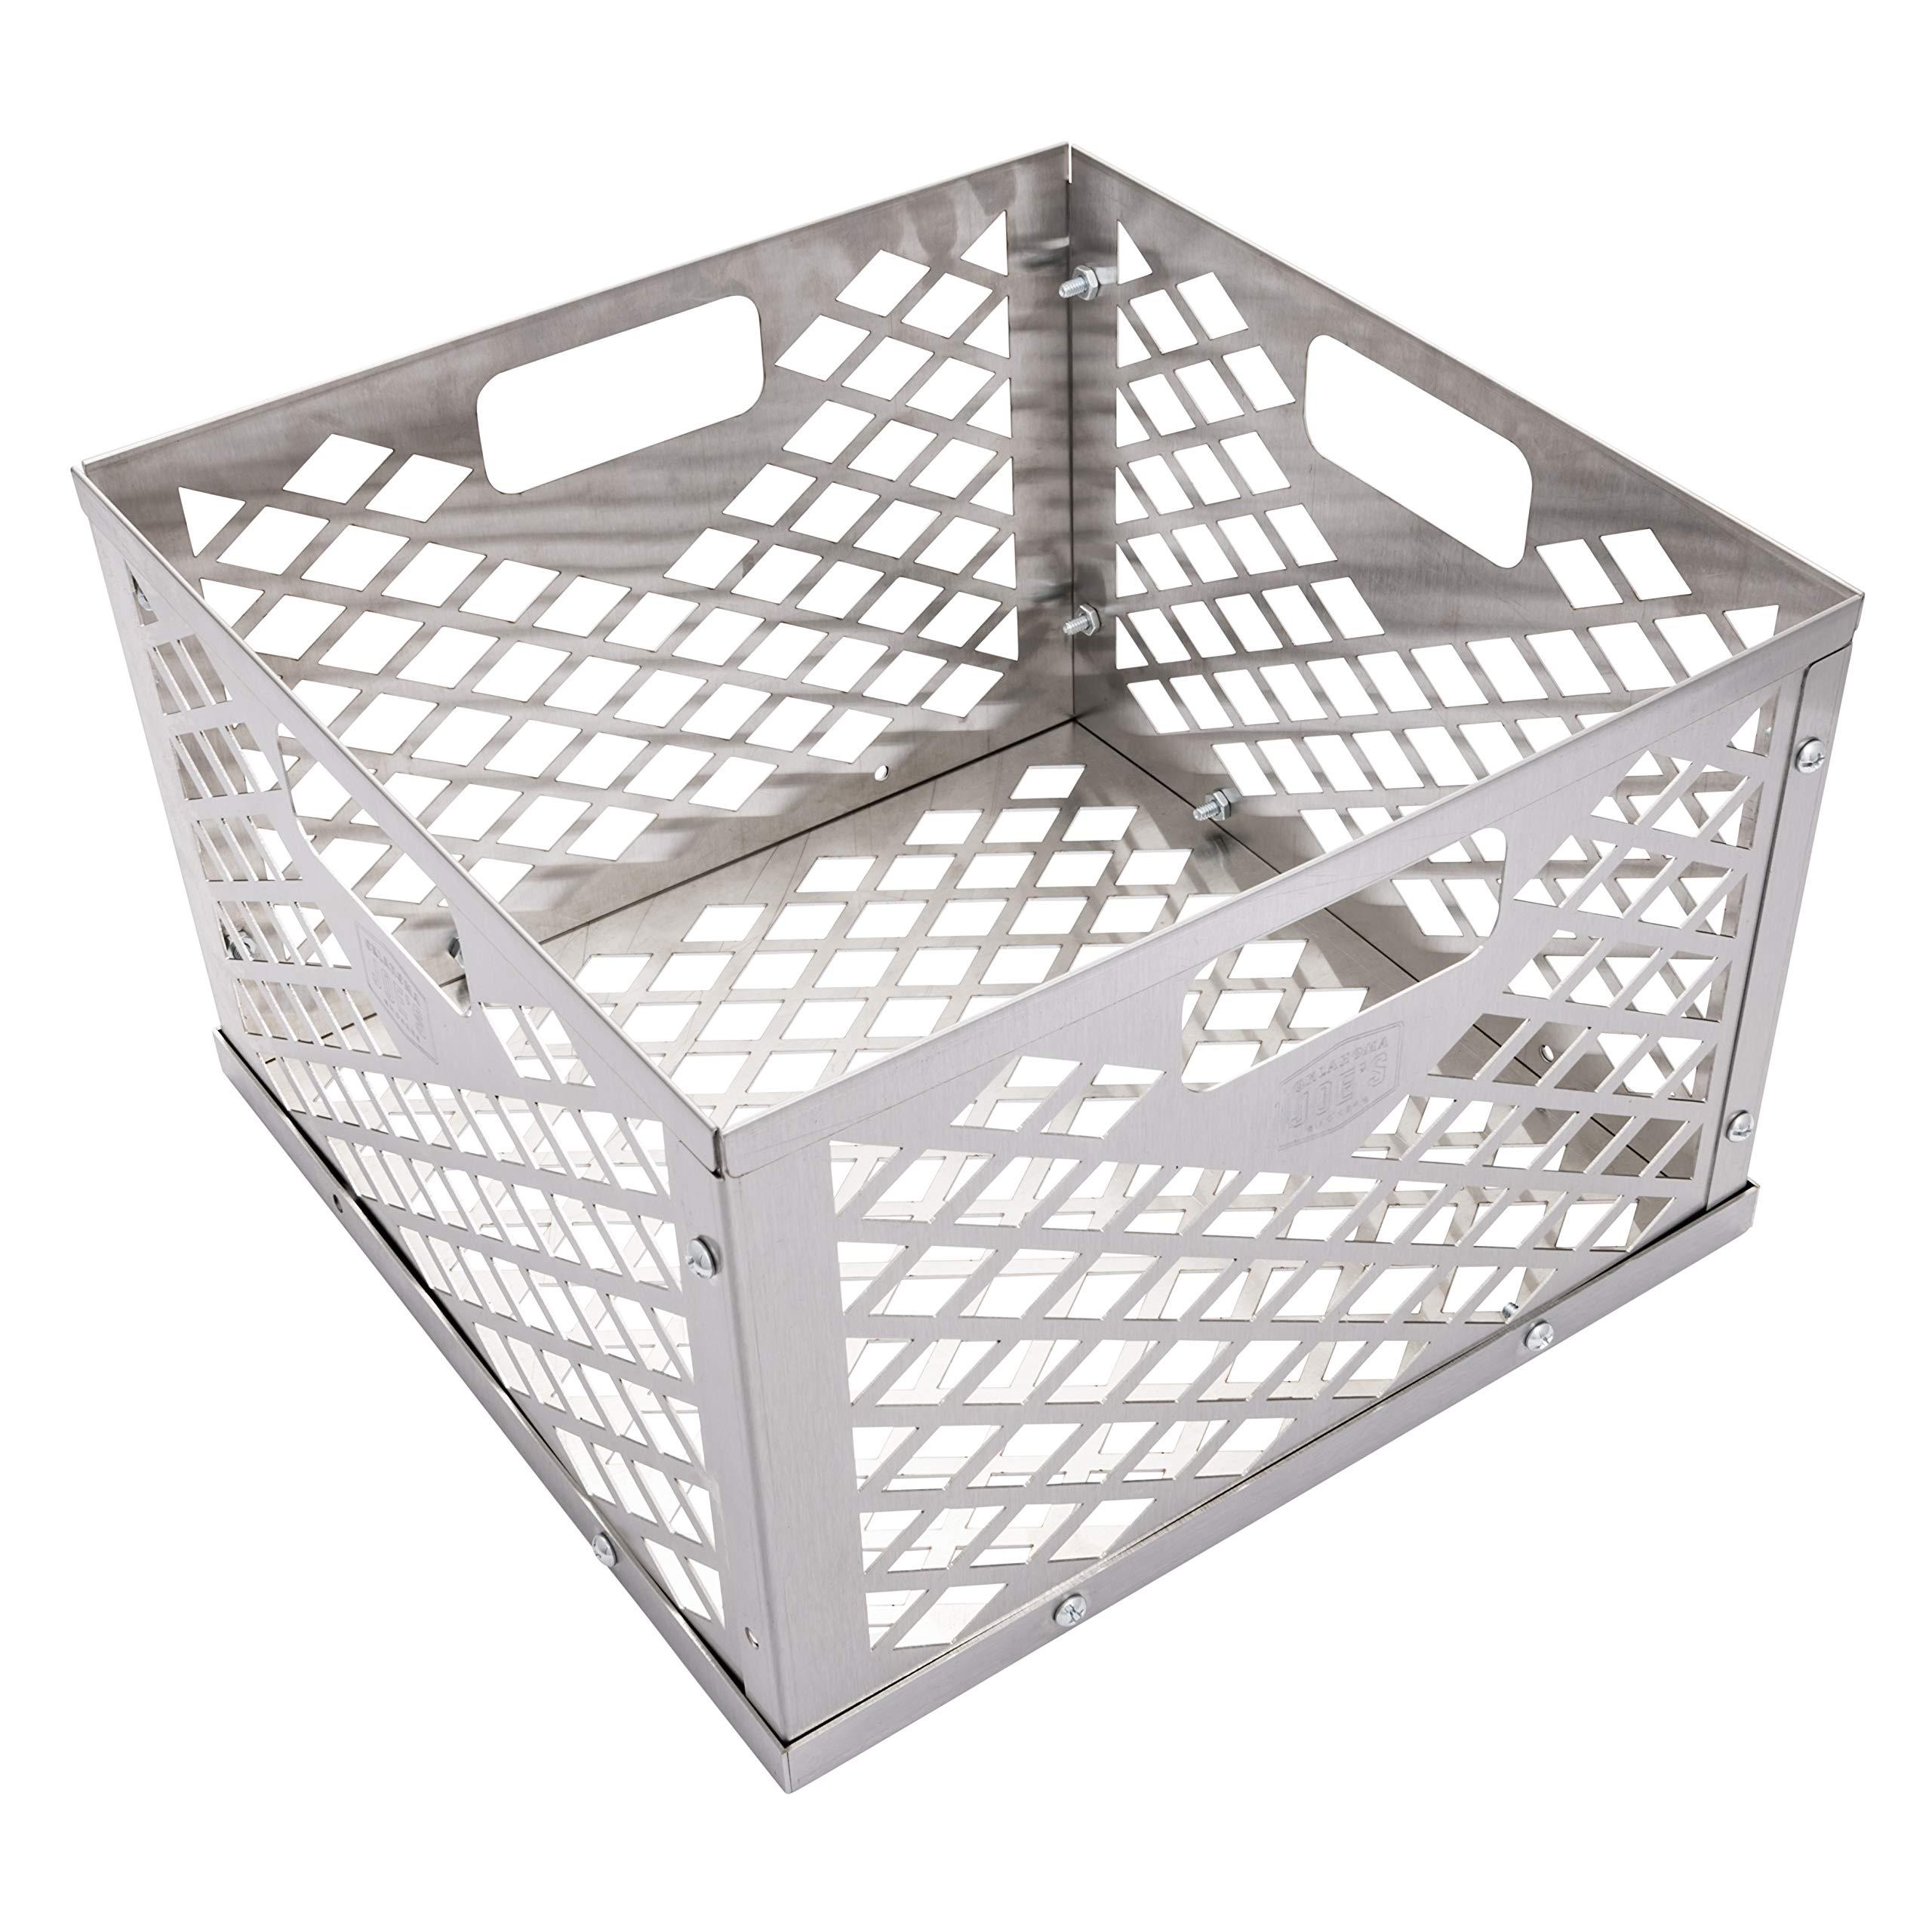 Oklahoma Joe's 5279338P04 Firebox Basket, Silver by Oklahoma Joe's